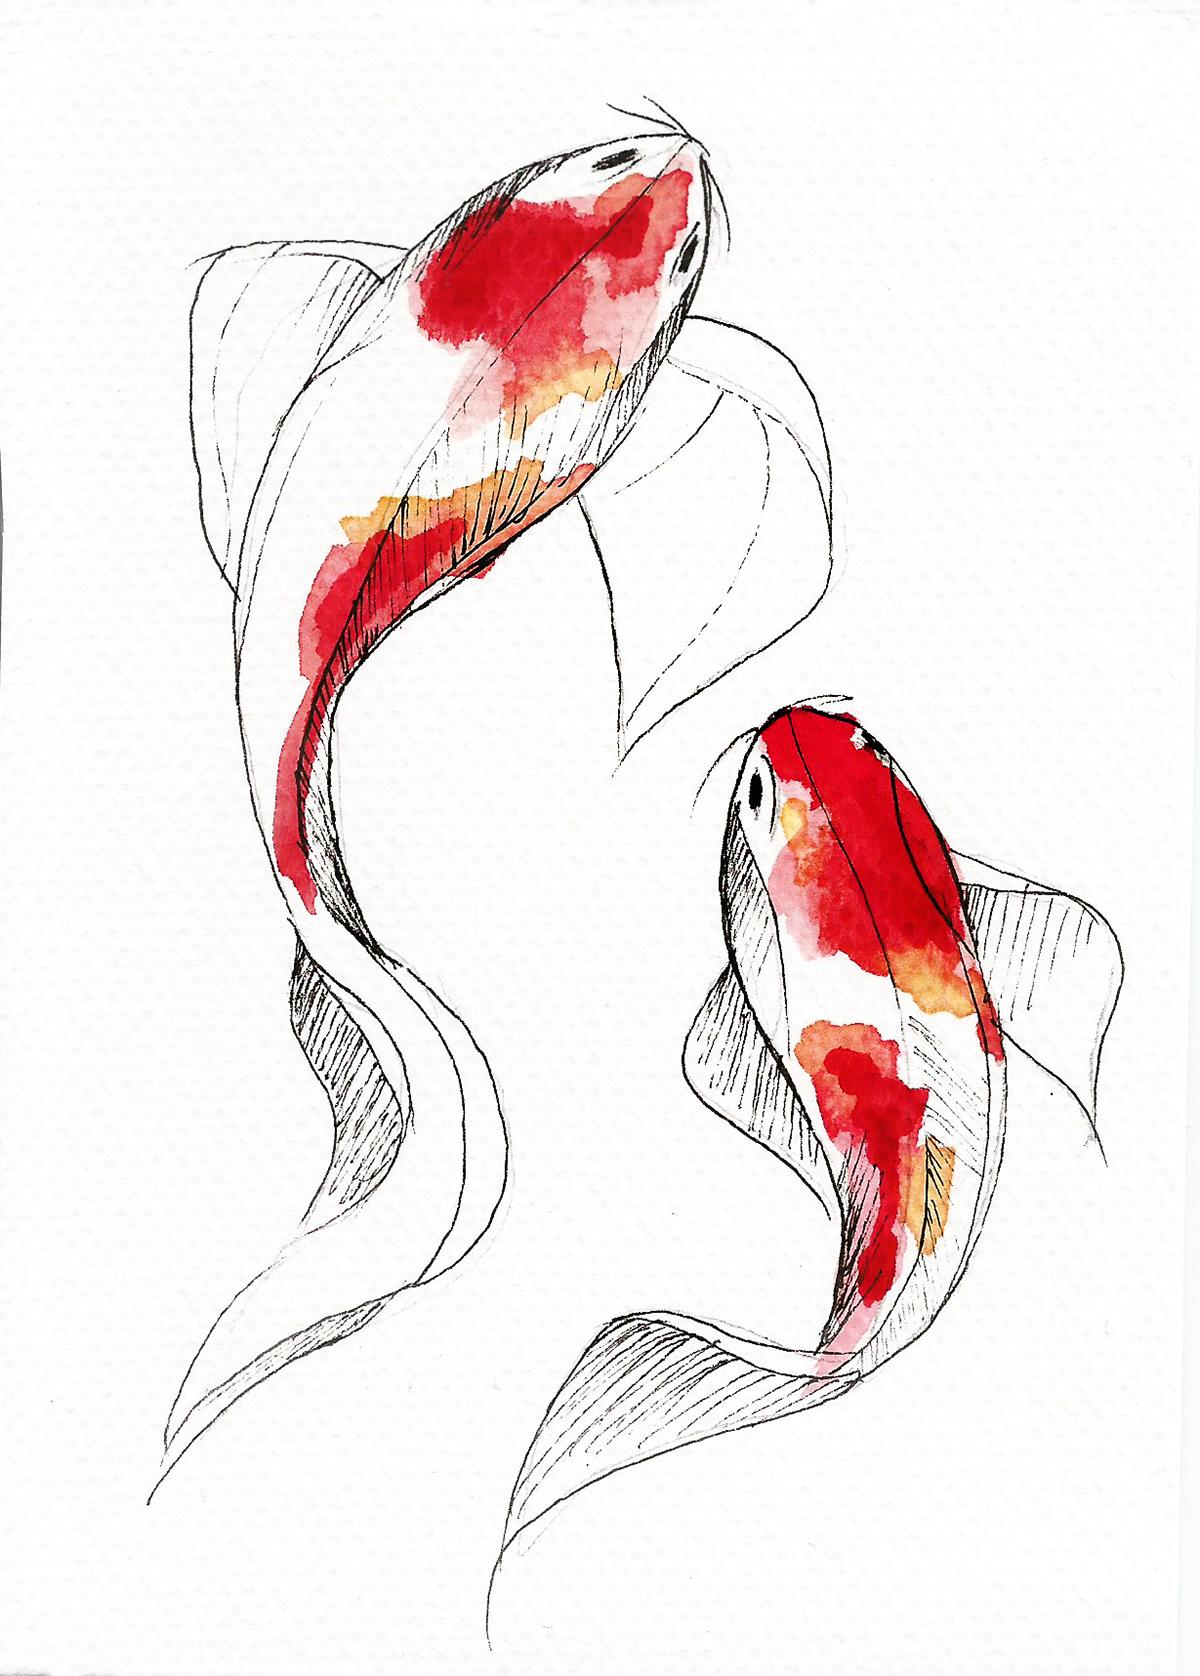 Watercolor Koi Fish On Behance Koi Art Koi Fish Drawing Fish Drawings